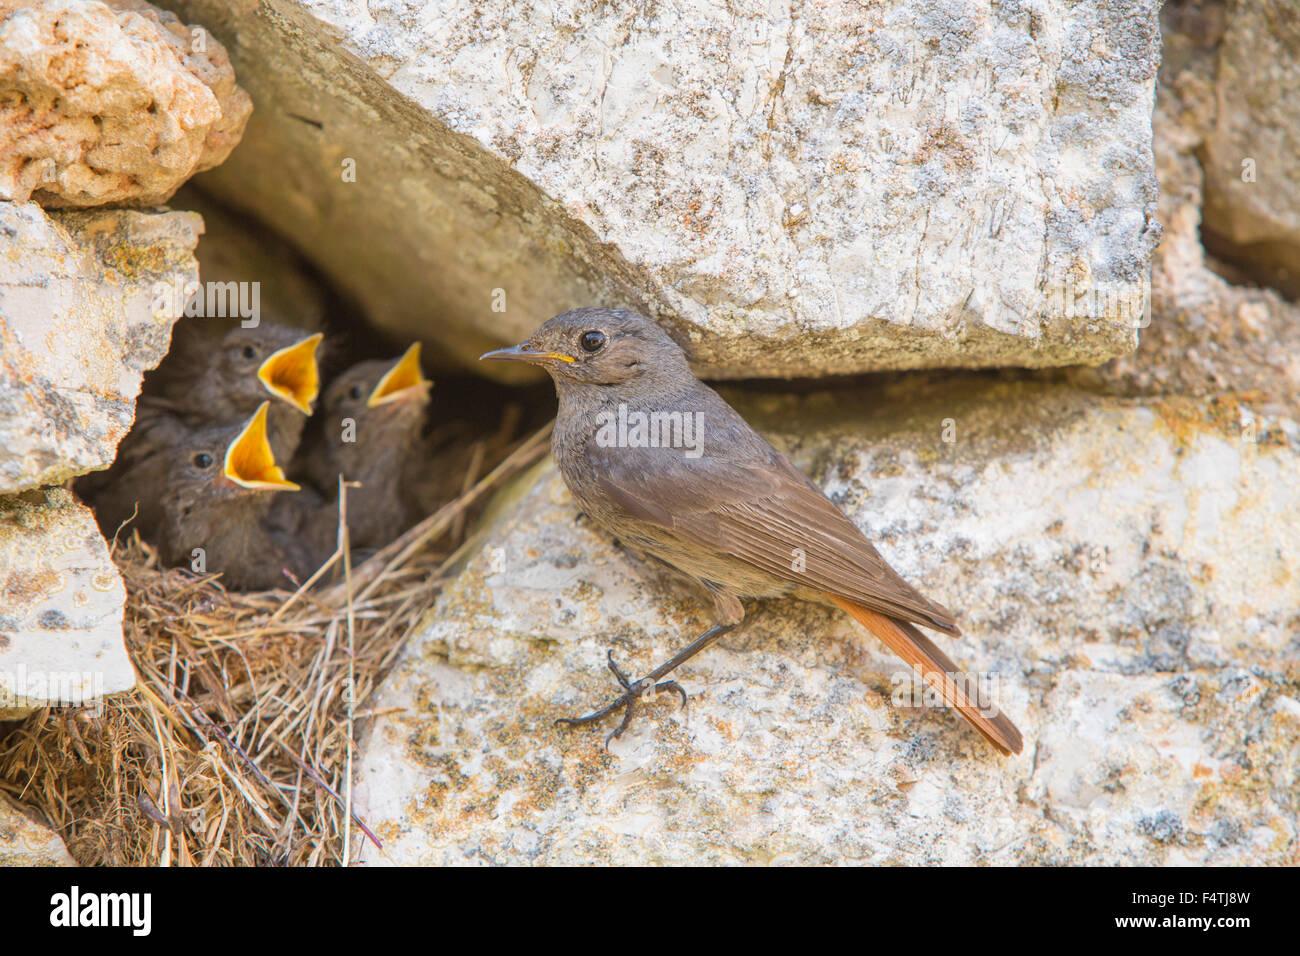 Blak redstart, birds, - Stock Image